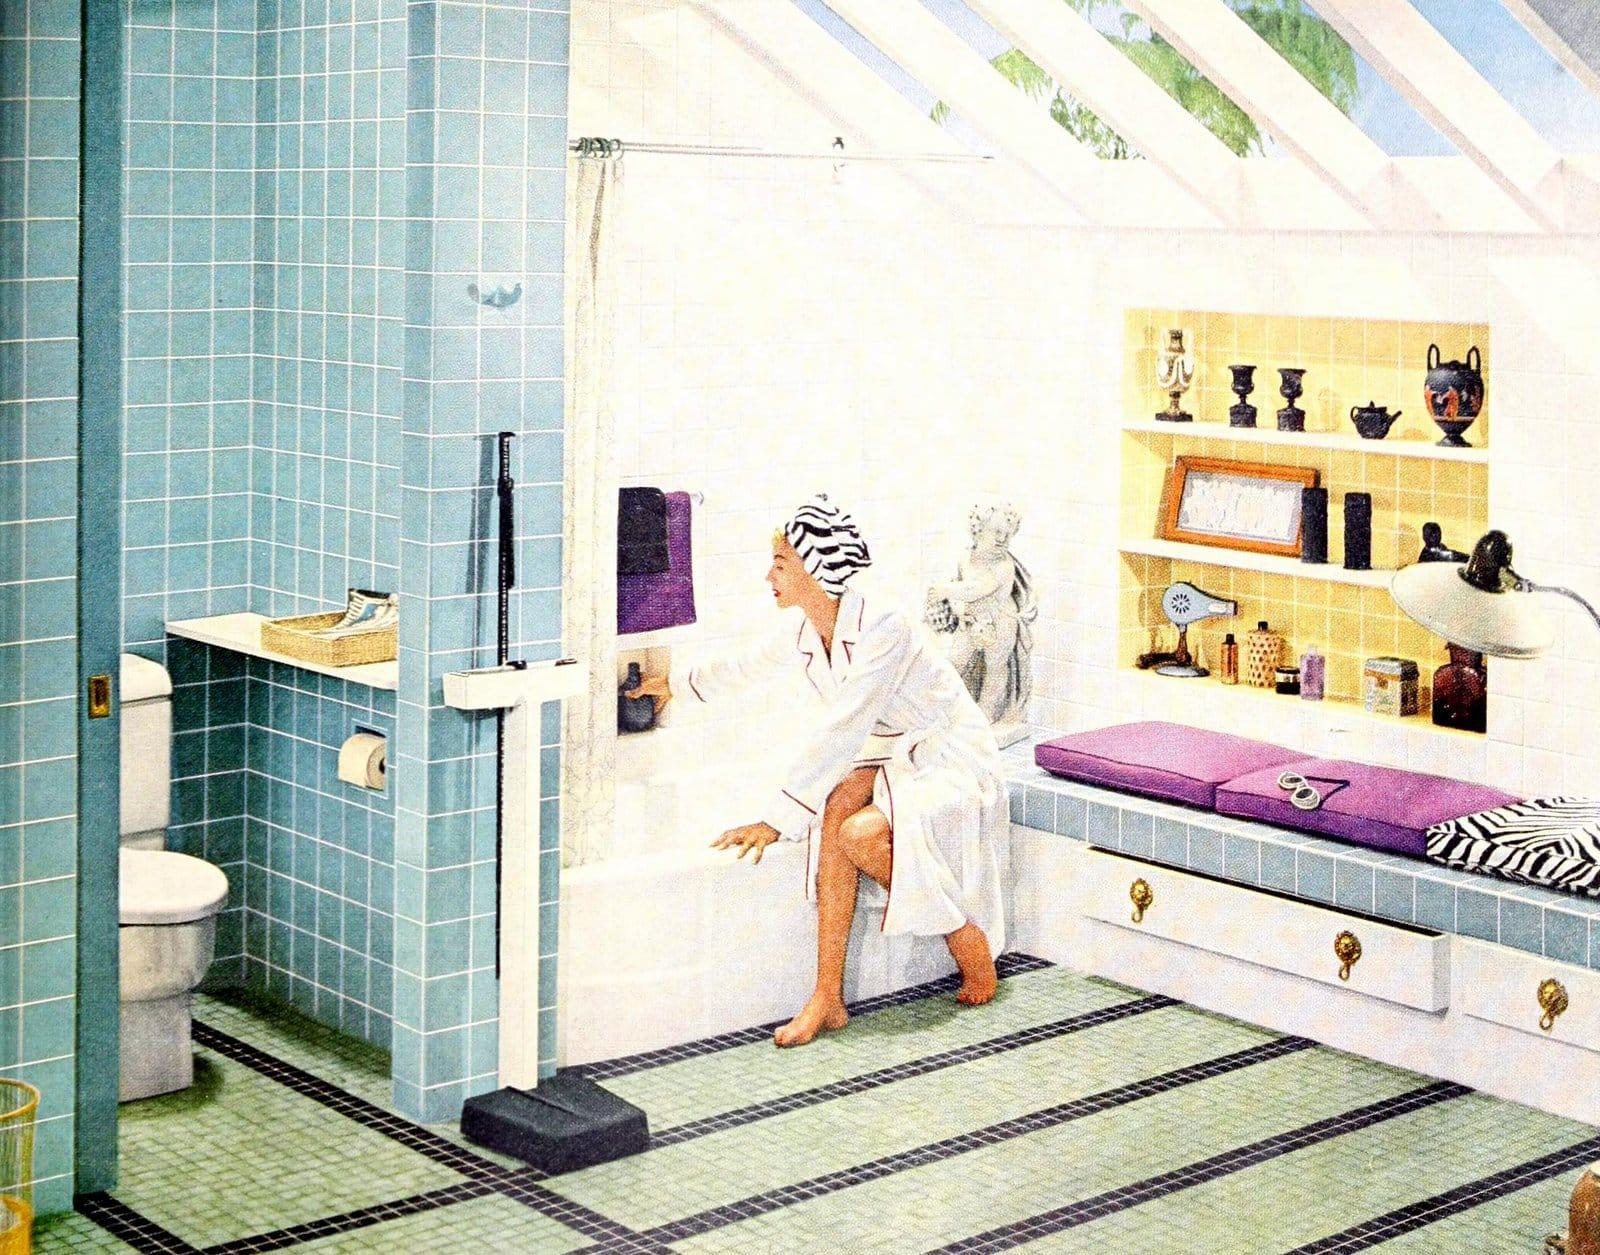 Vintage bathroom tile design ideas from 1955